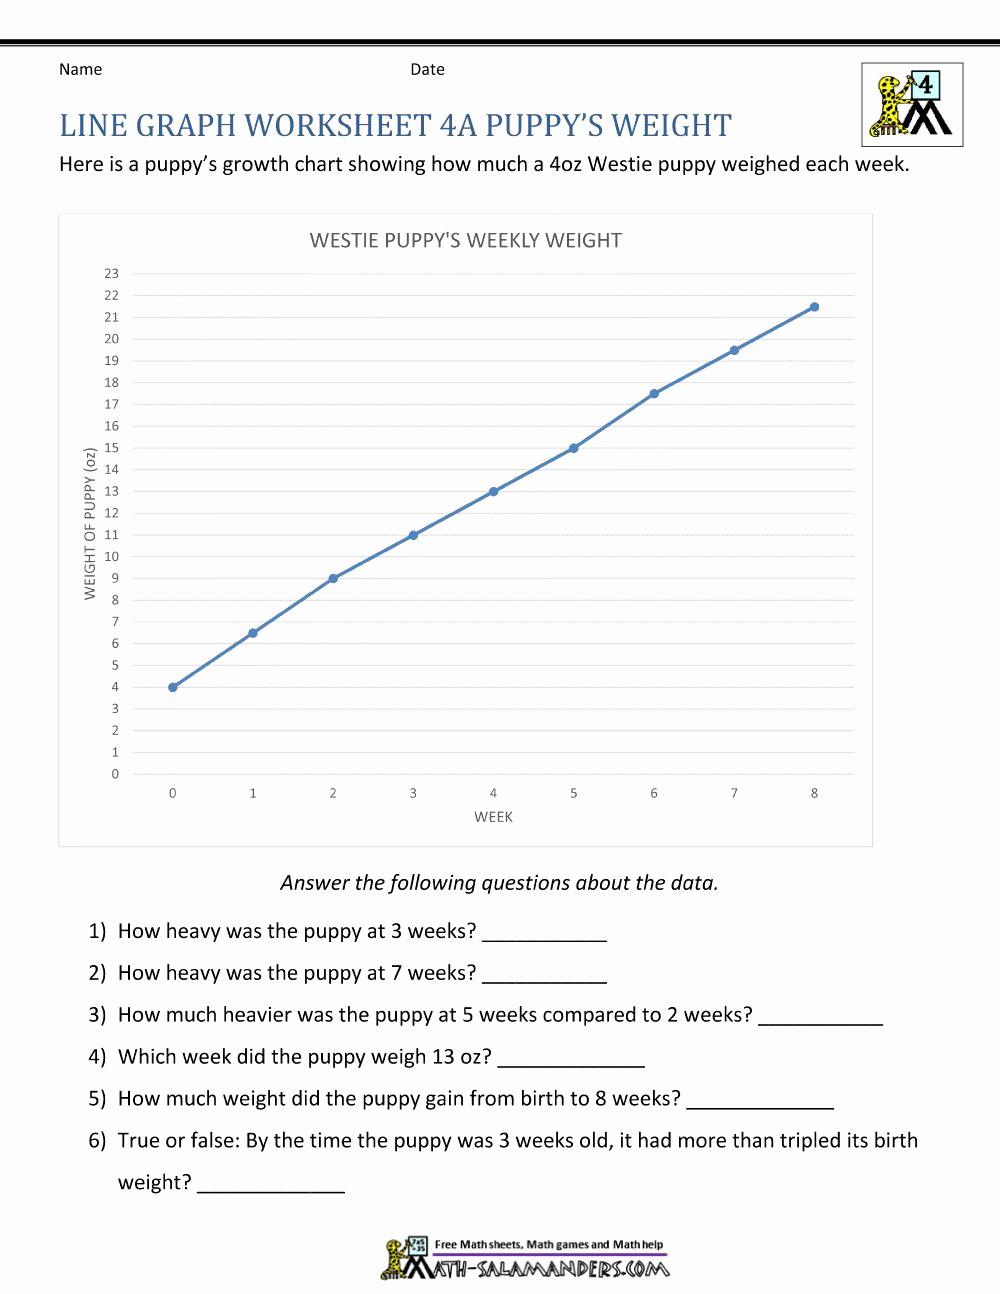 Line Graph Worksheet 5th Grade Beautiful Line Graph Worksheets 5th Grade In 2020